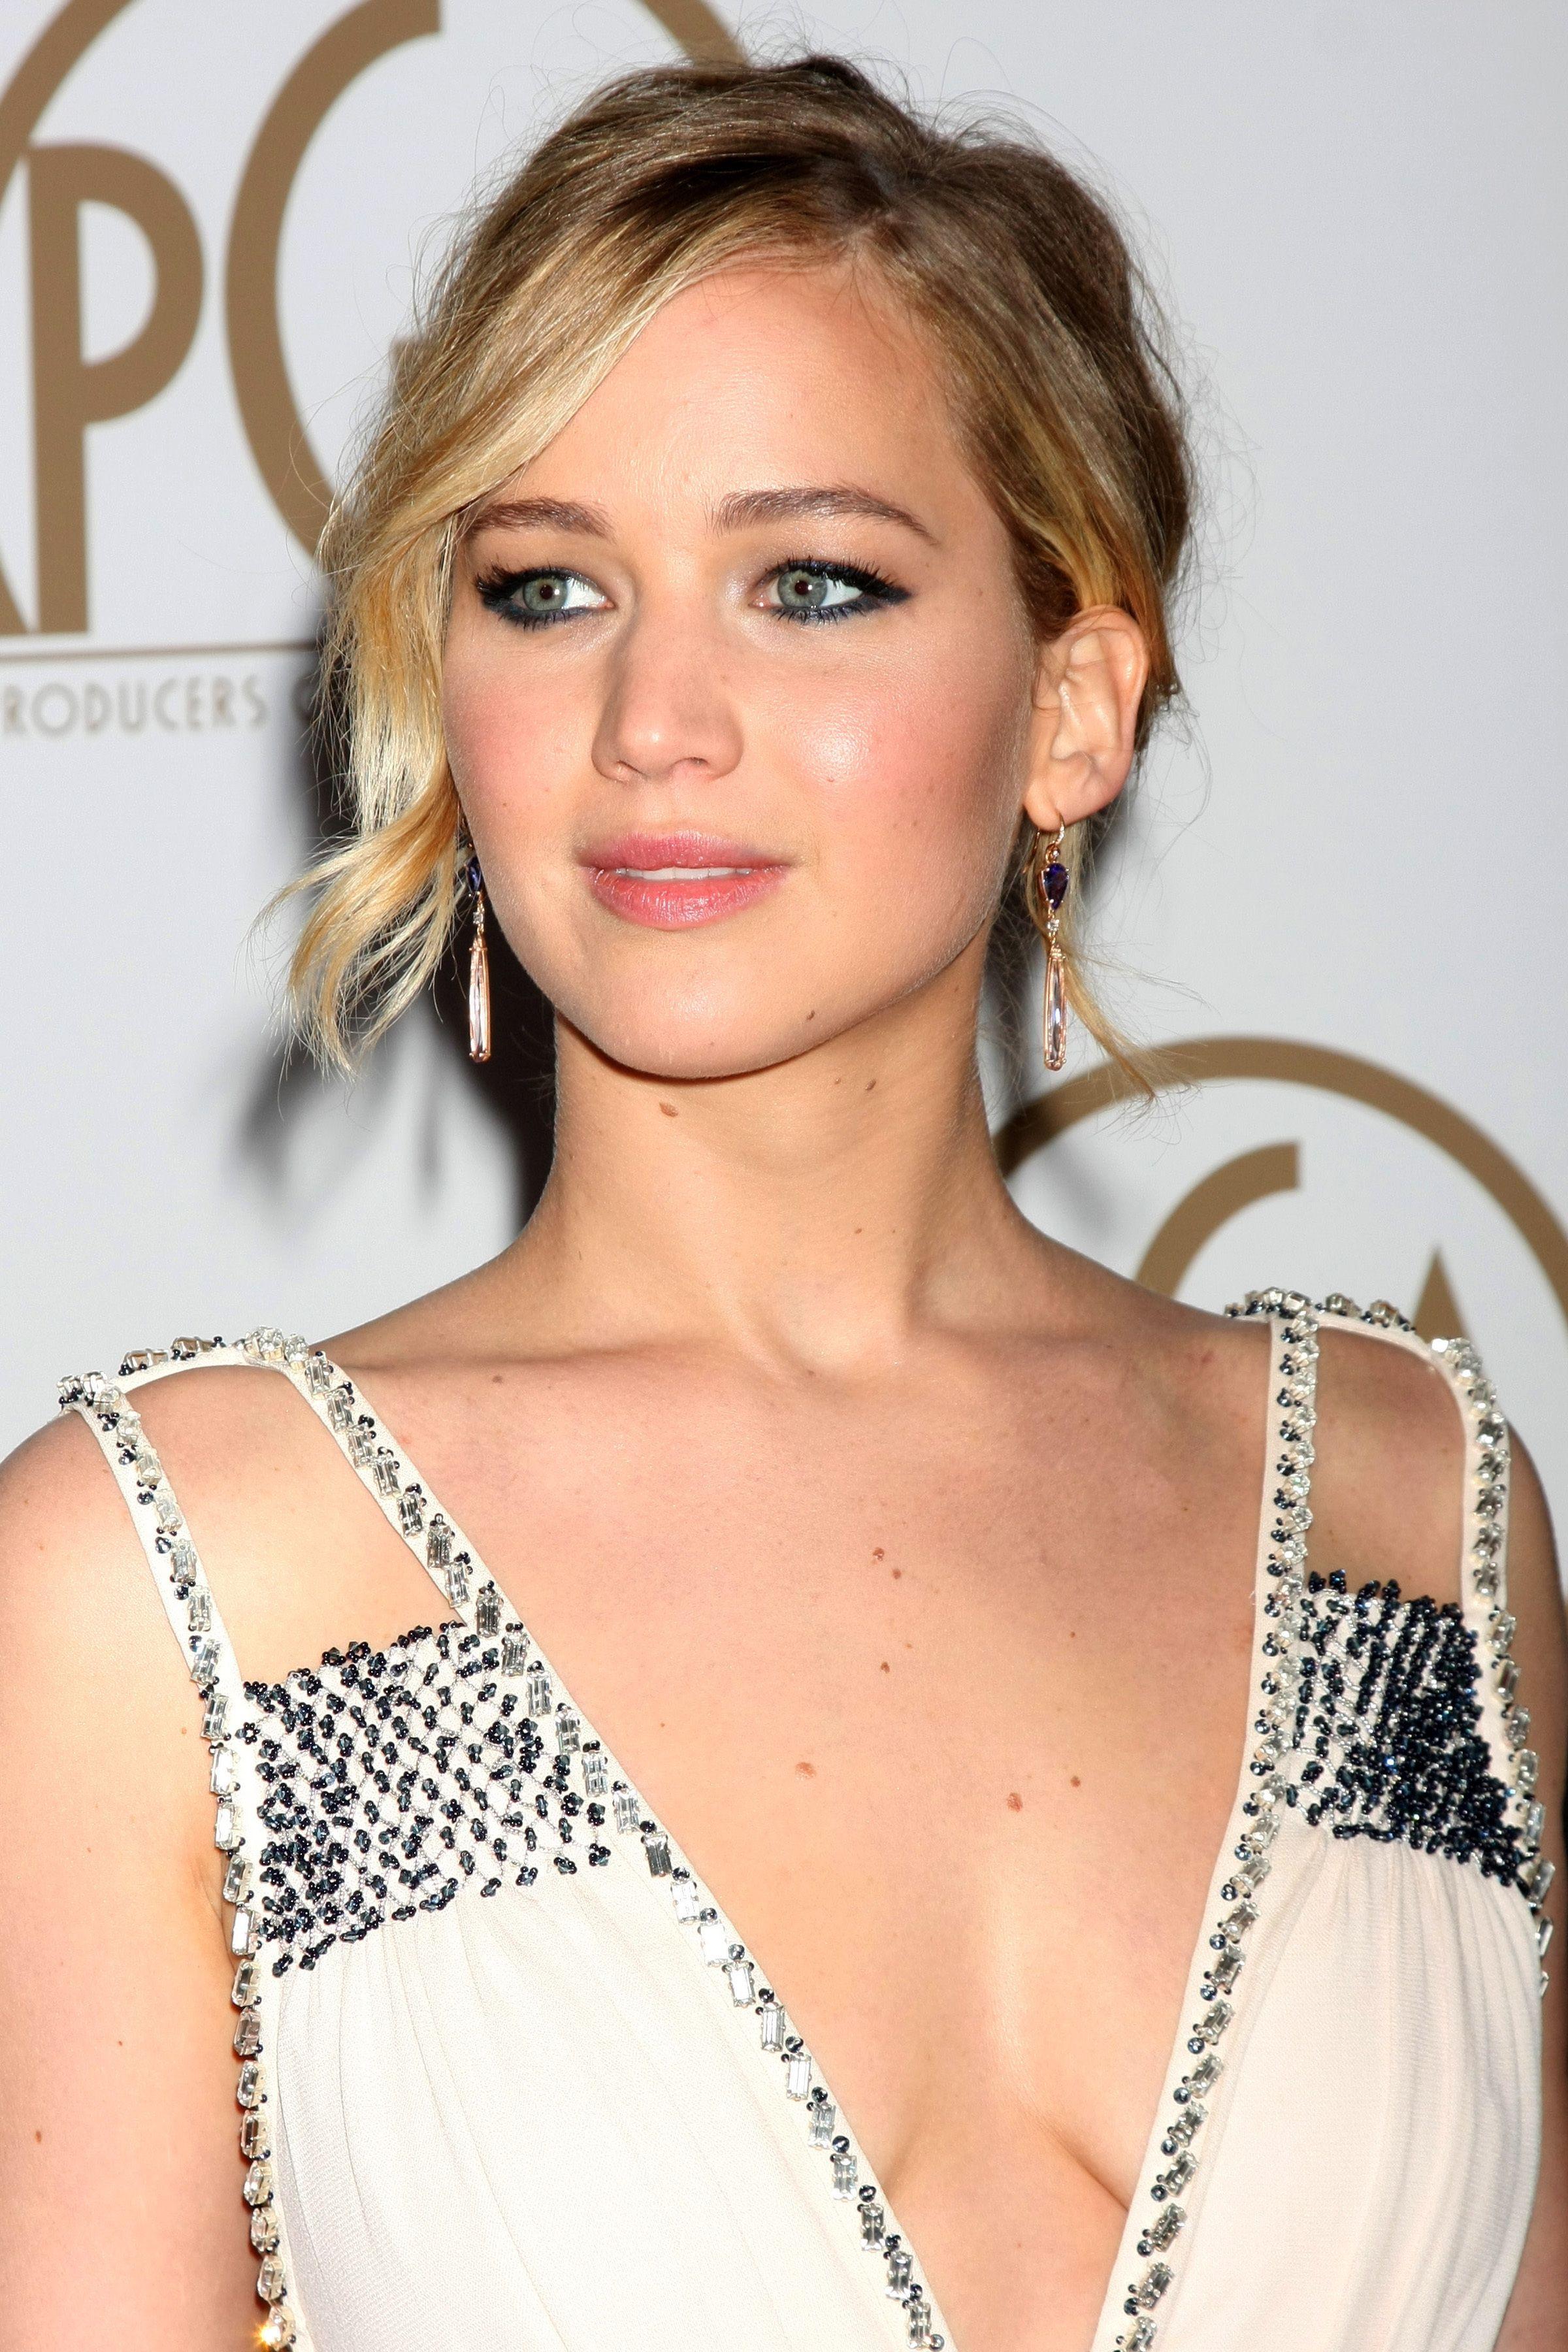 8. Jennifer Lawrence